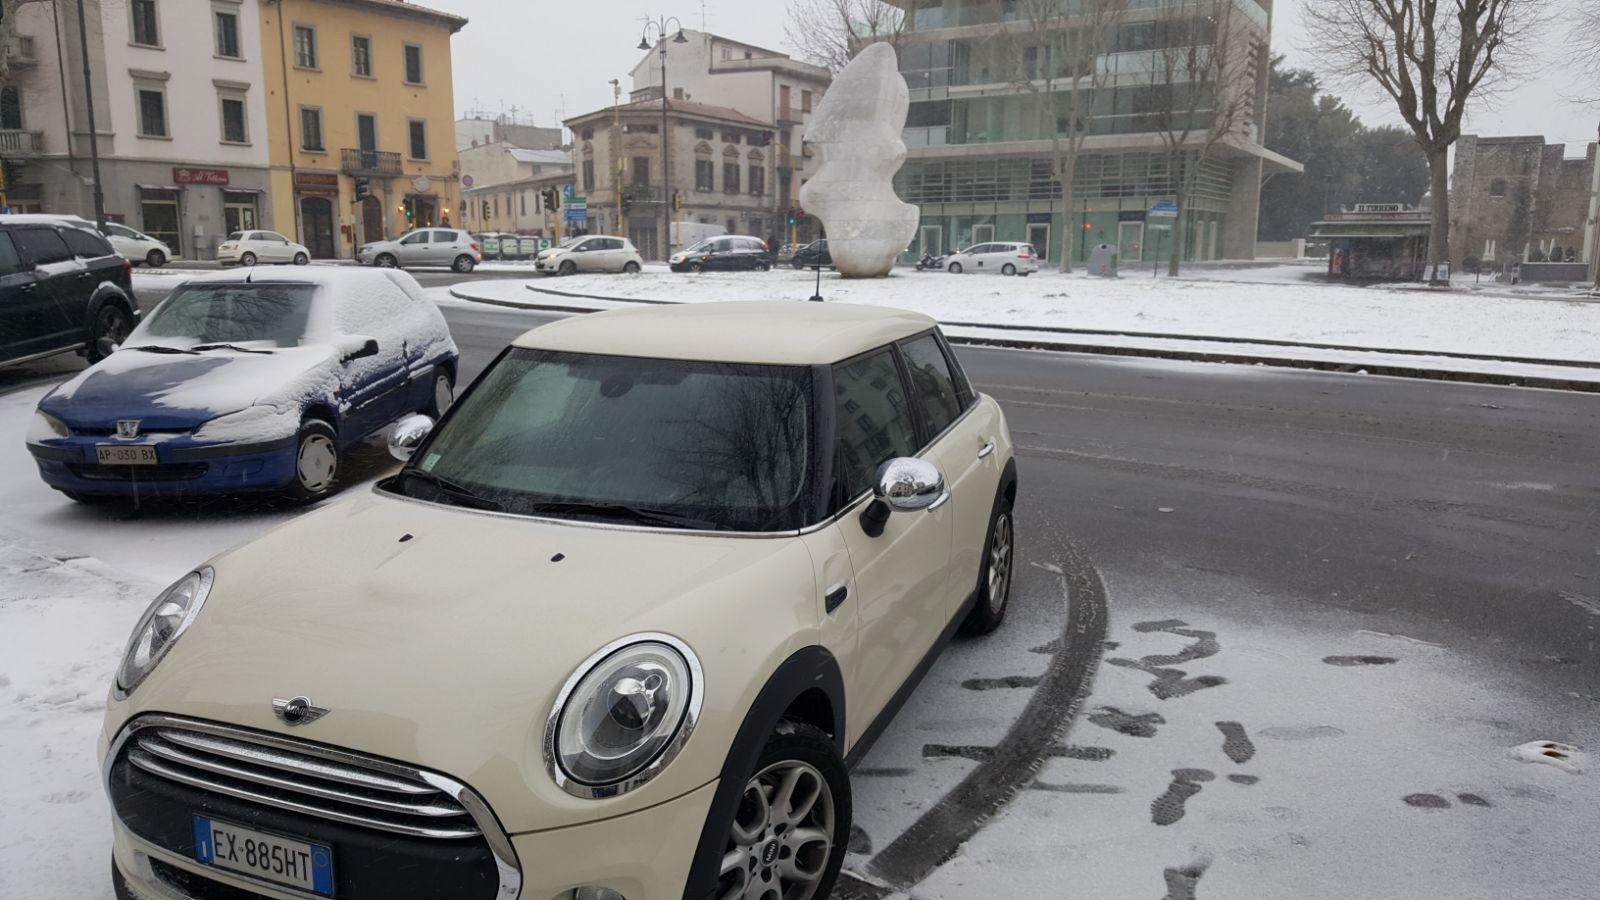 SNOW(e poi rain?)Casting Toscana Giovedi 1 marzo 2018-img-20180301-wa0119.jpg